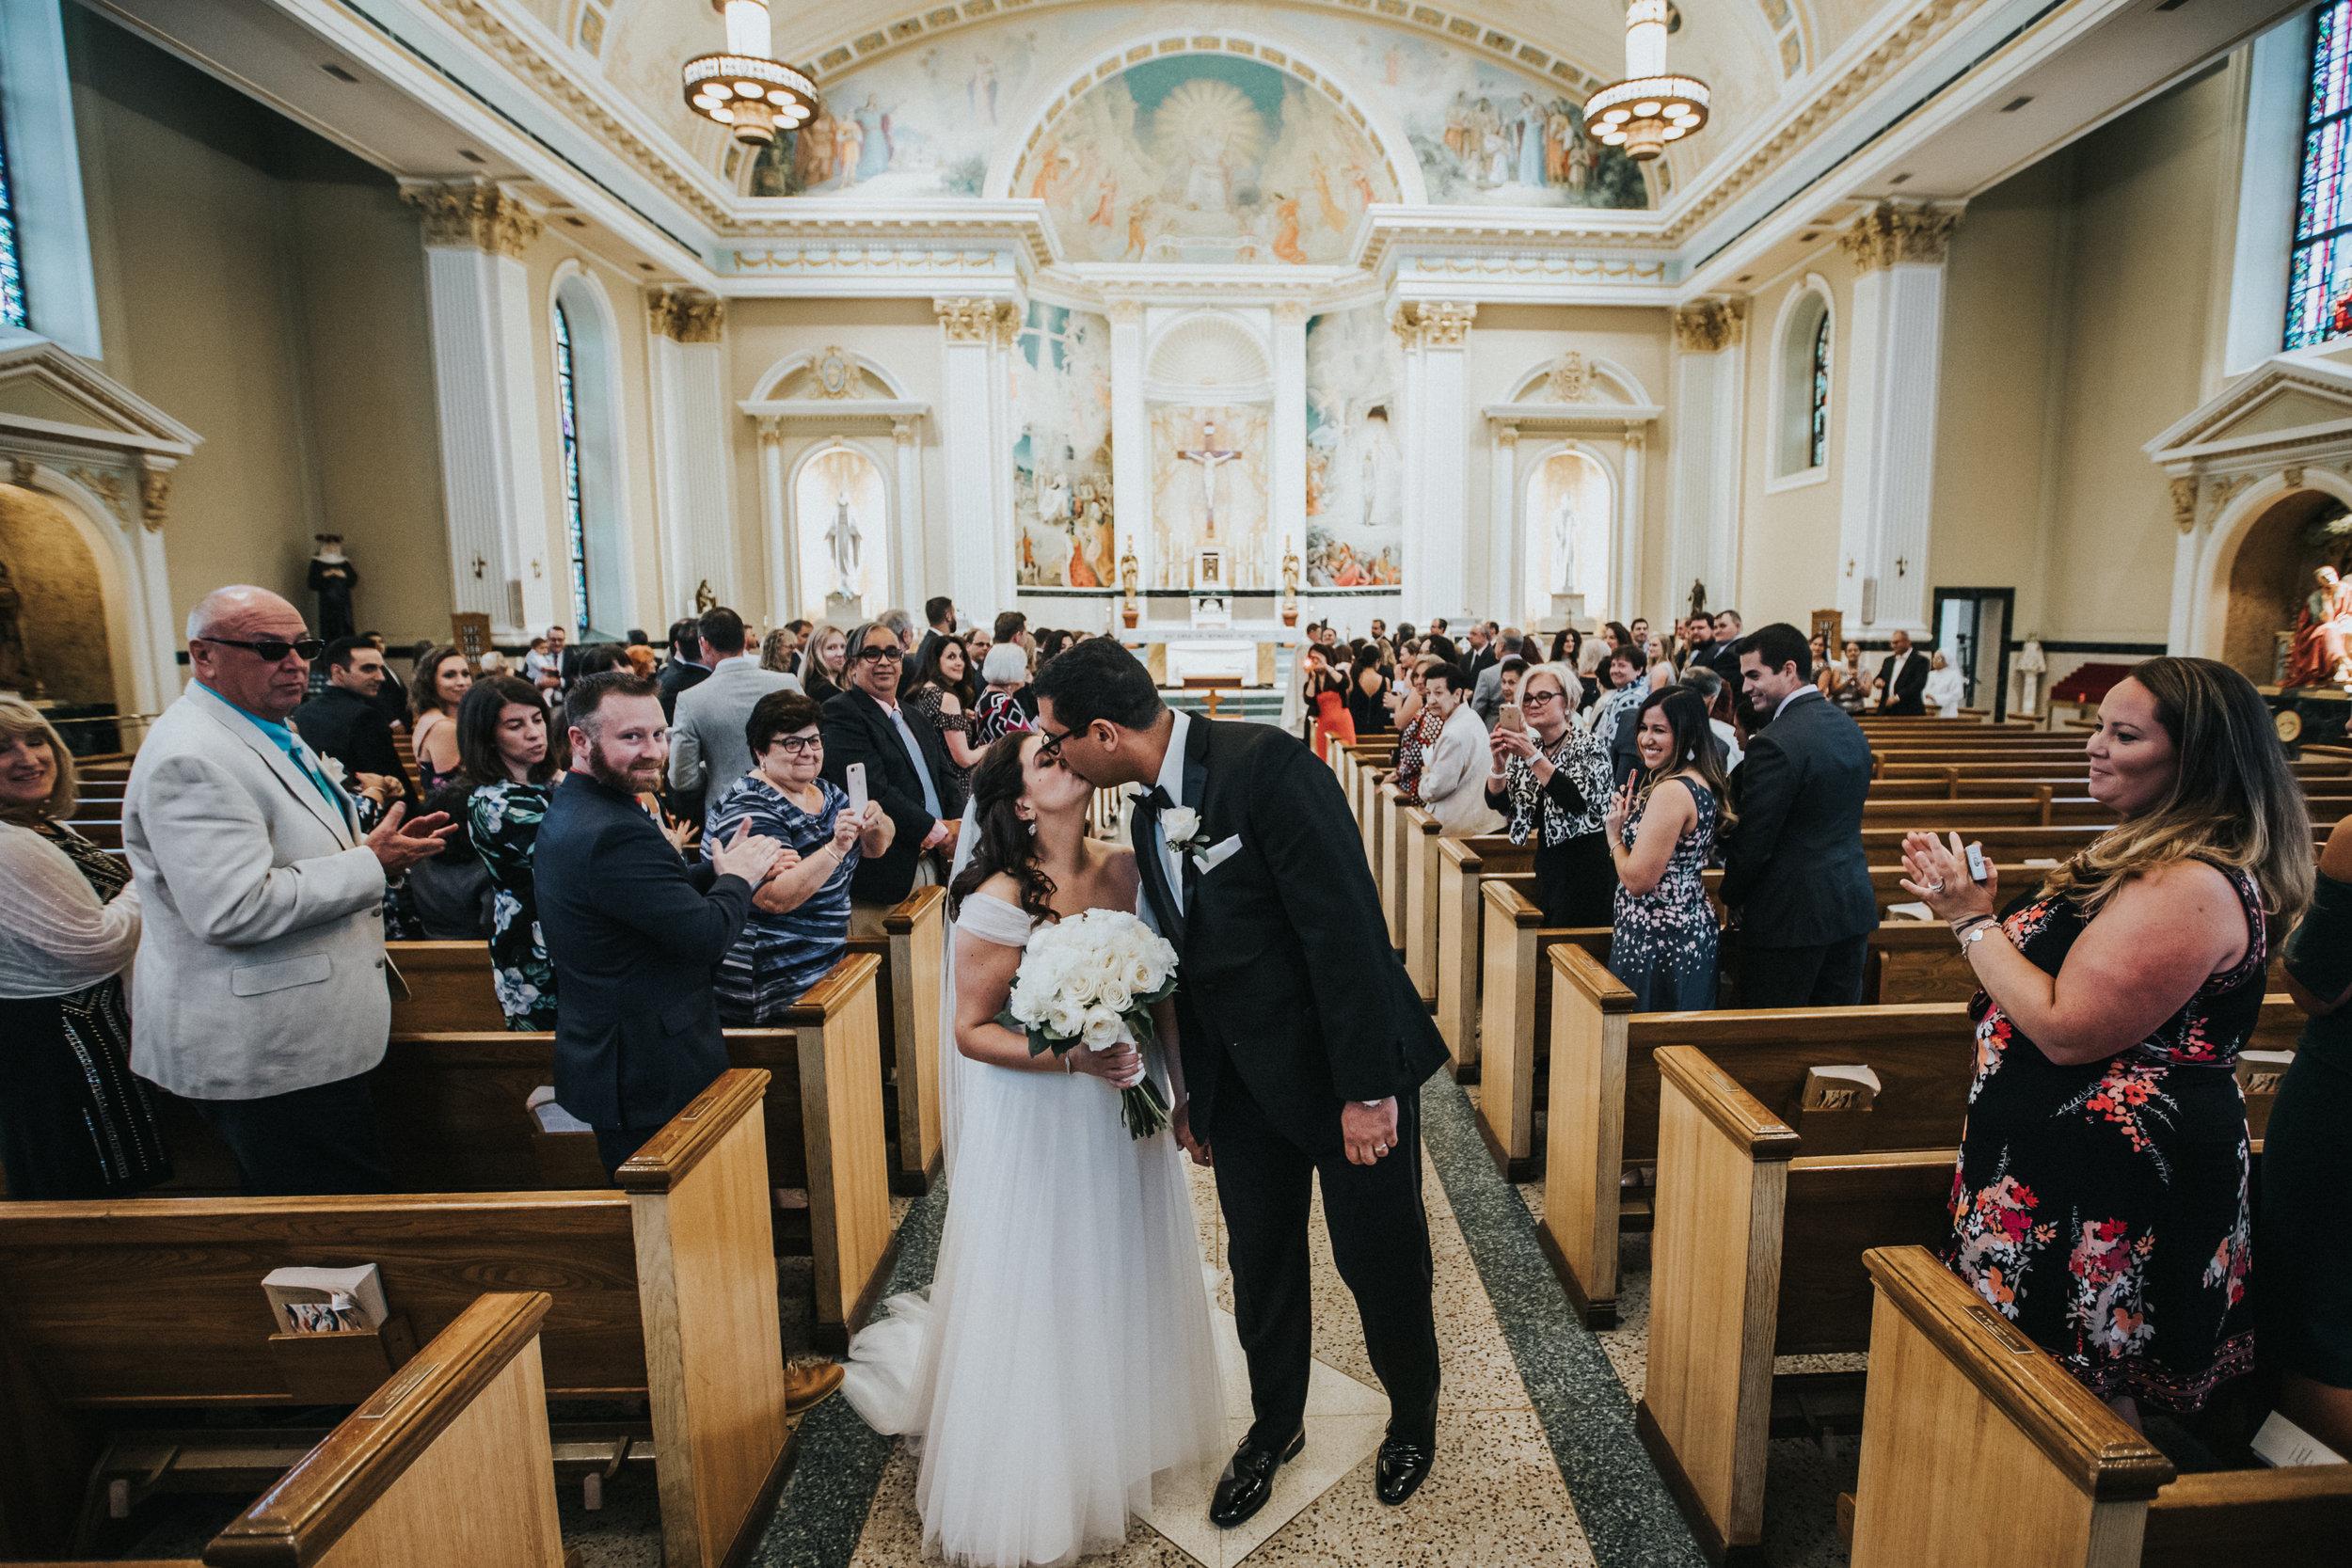 JennaLynnPhotography-NJWeddingPhotographer-Philadelphia-Wedding-ArtsBallroom-Ceremony-128.jpg